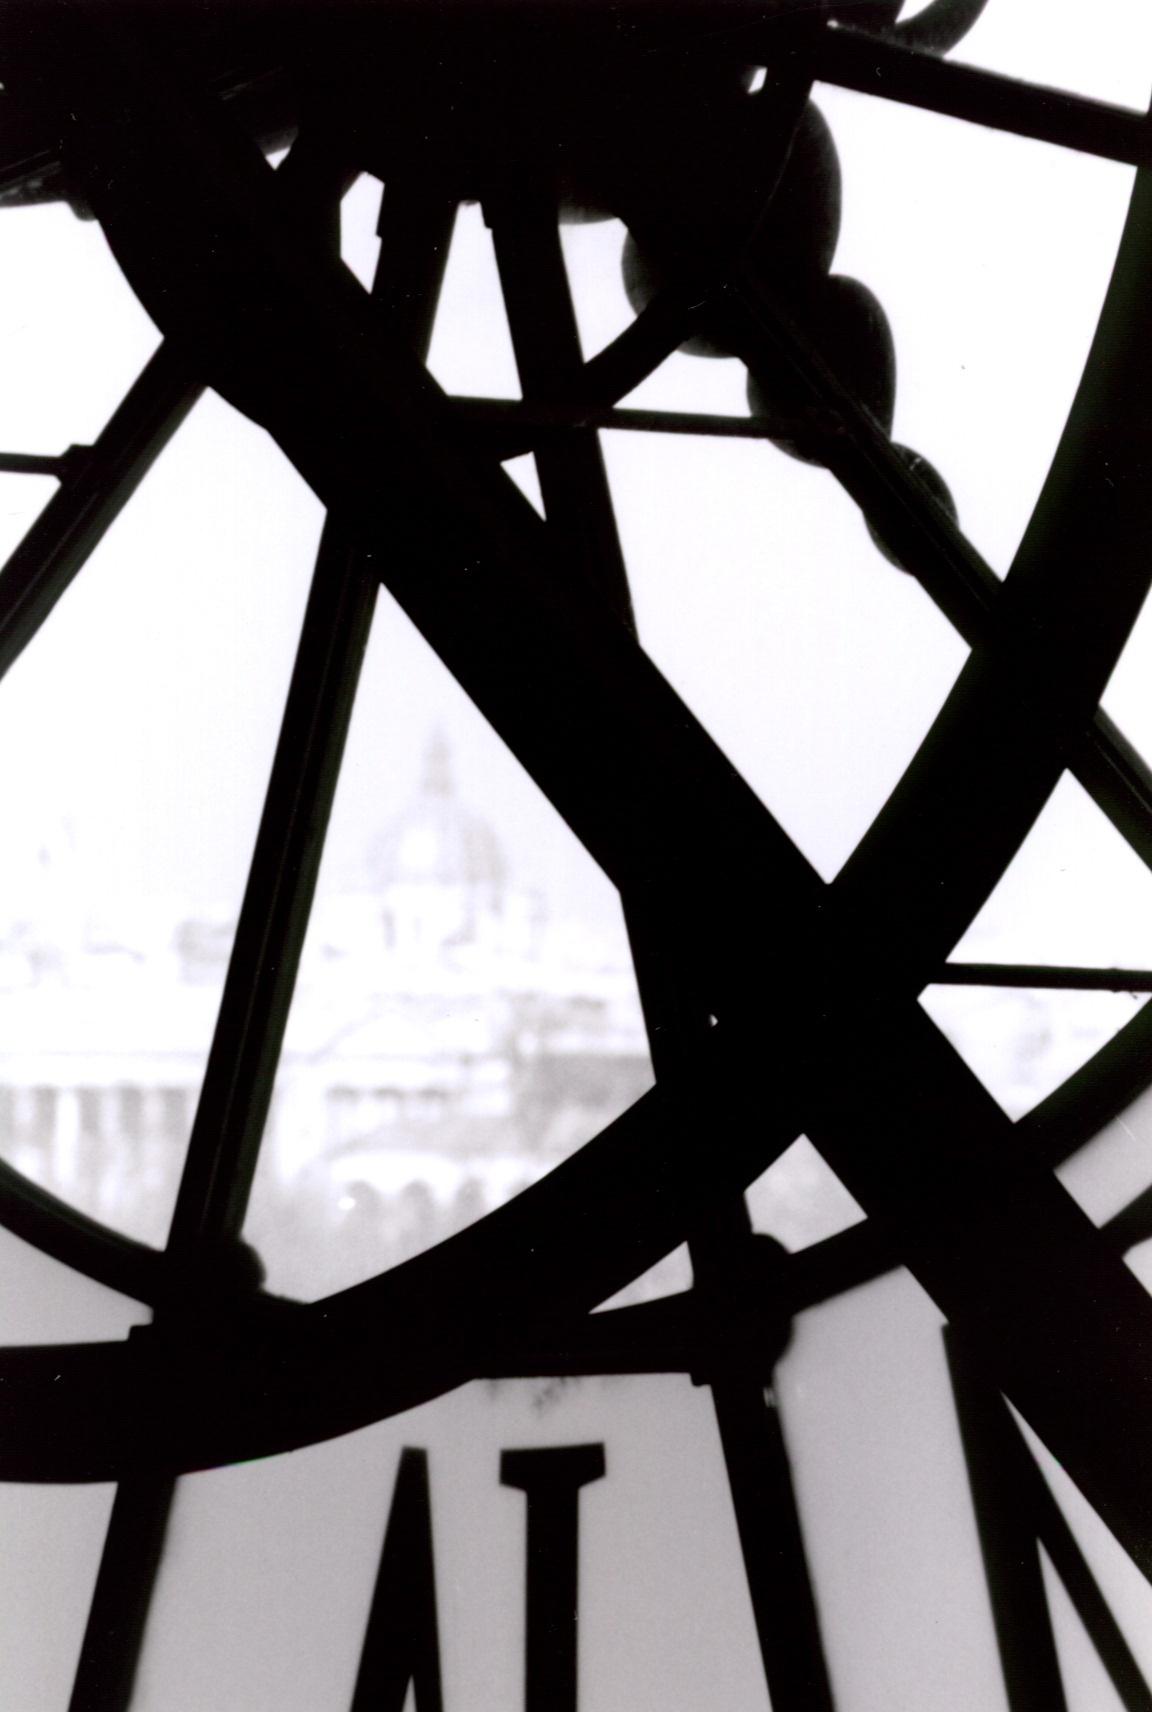 Paris (Montmartre Seen from the Musée d'Orsay Clock Tower)